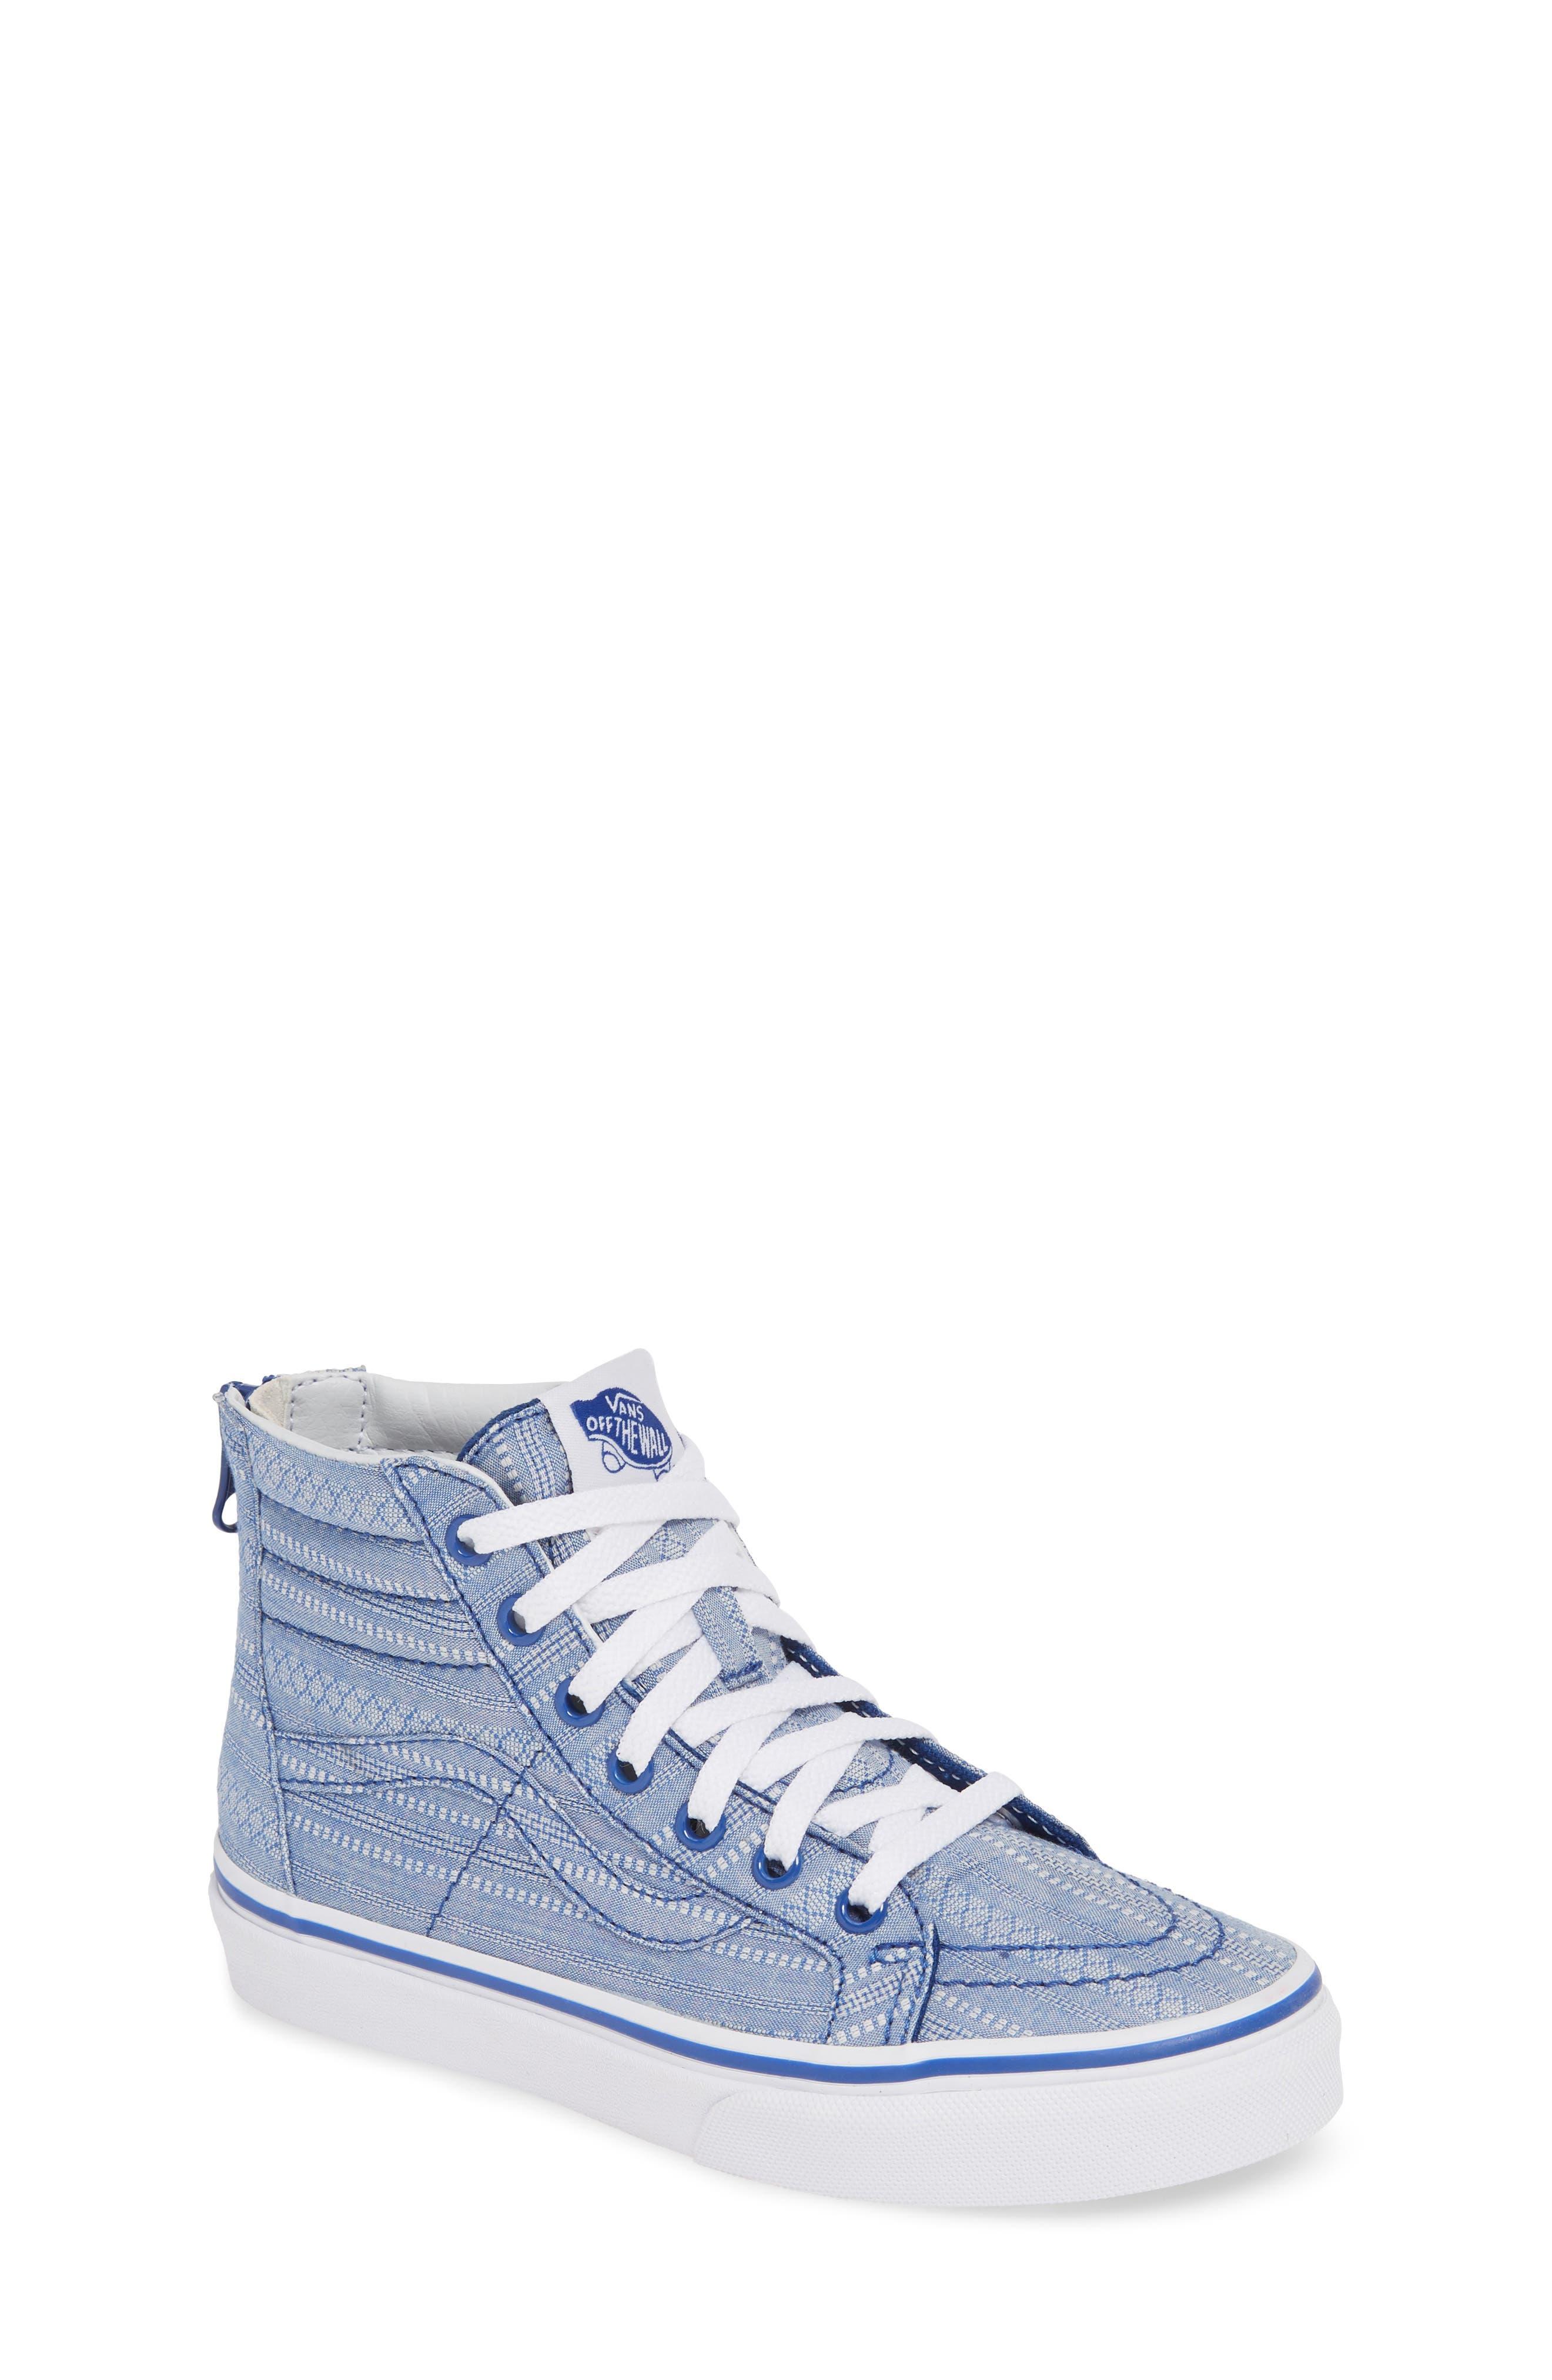 VANS, Sk8-Hi Zip Sneaker, Main thumbnail 1, color, TRUE BLUE/ TRUE WHITE